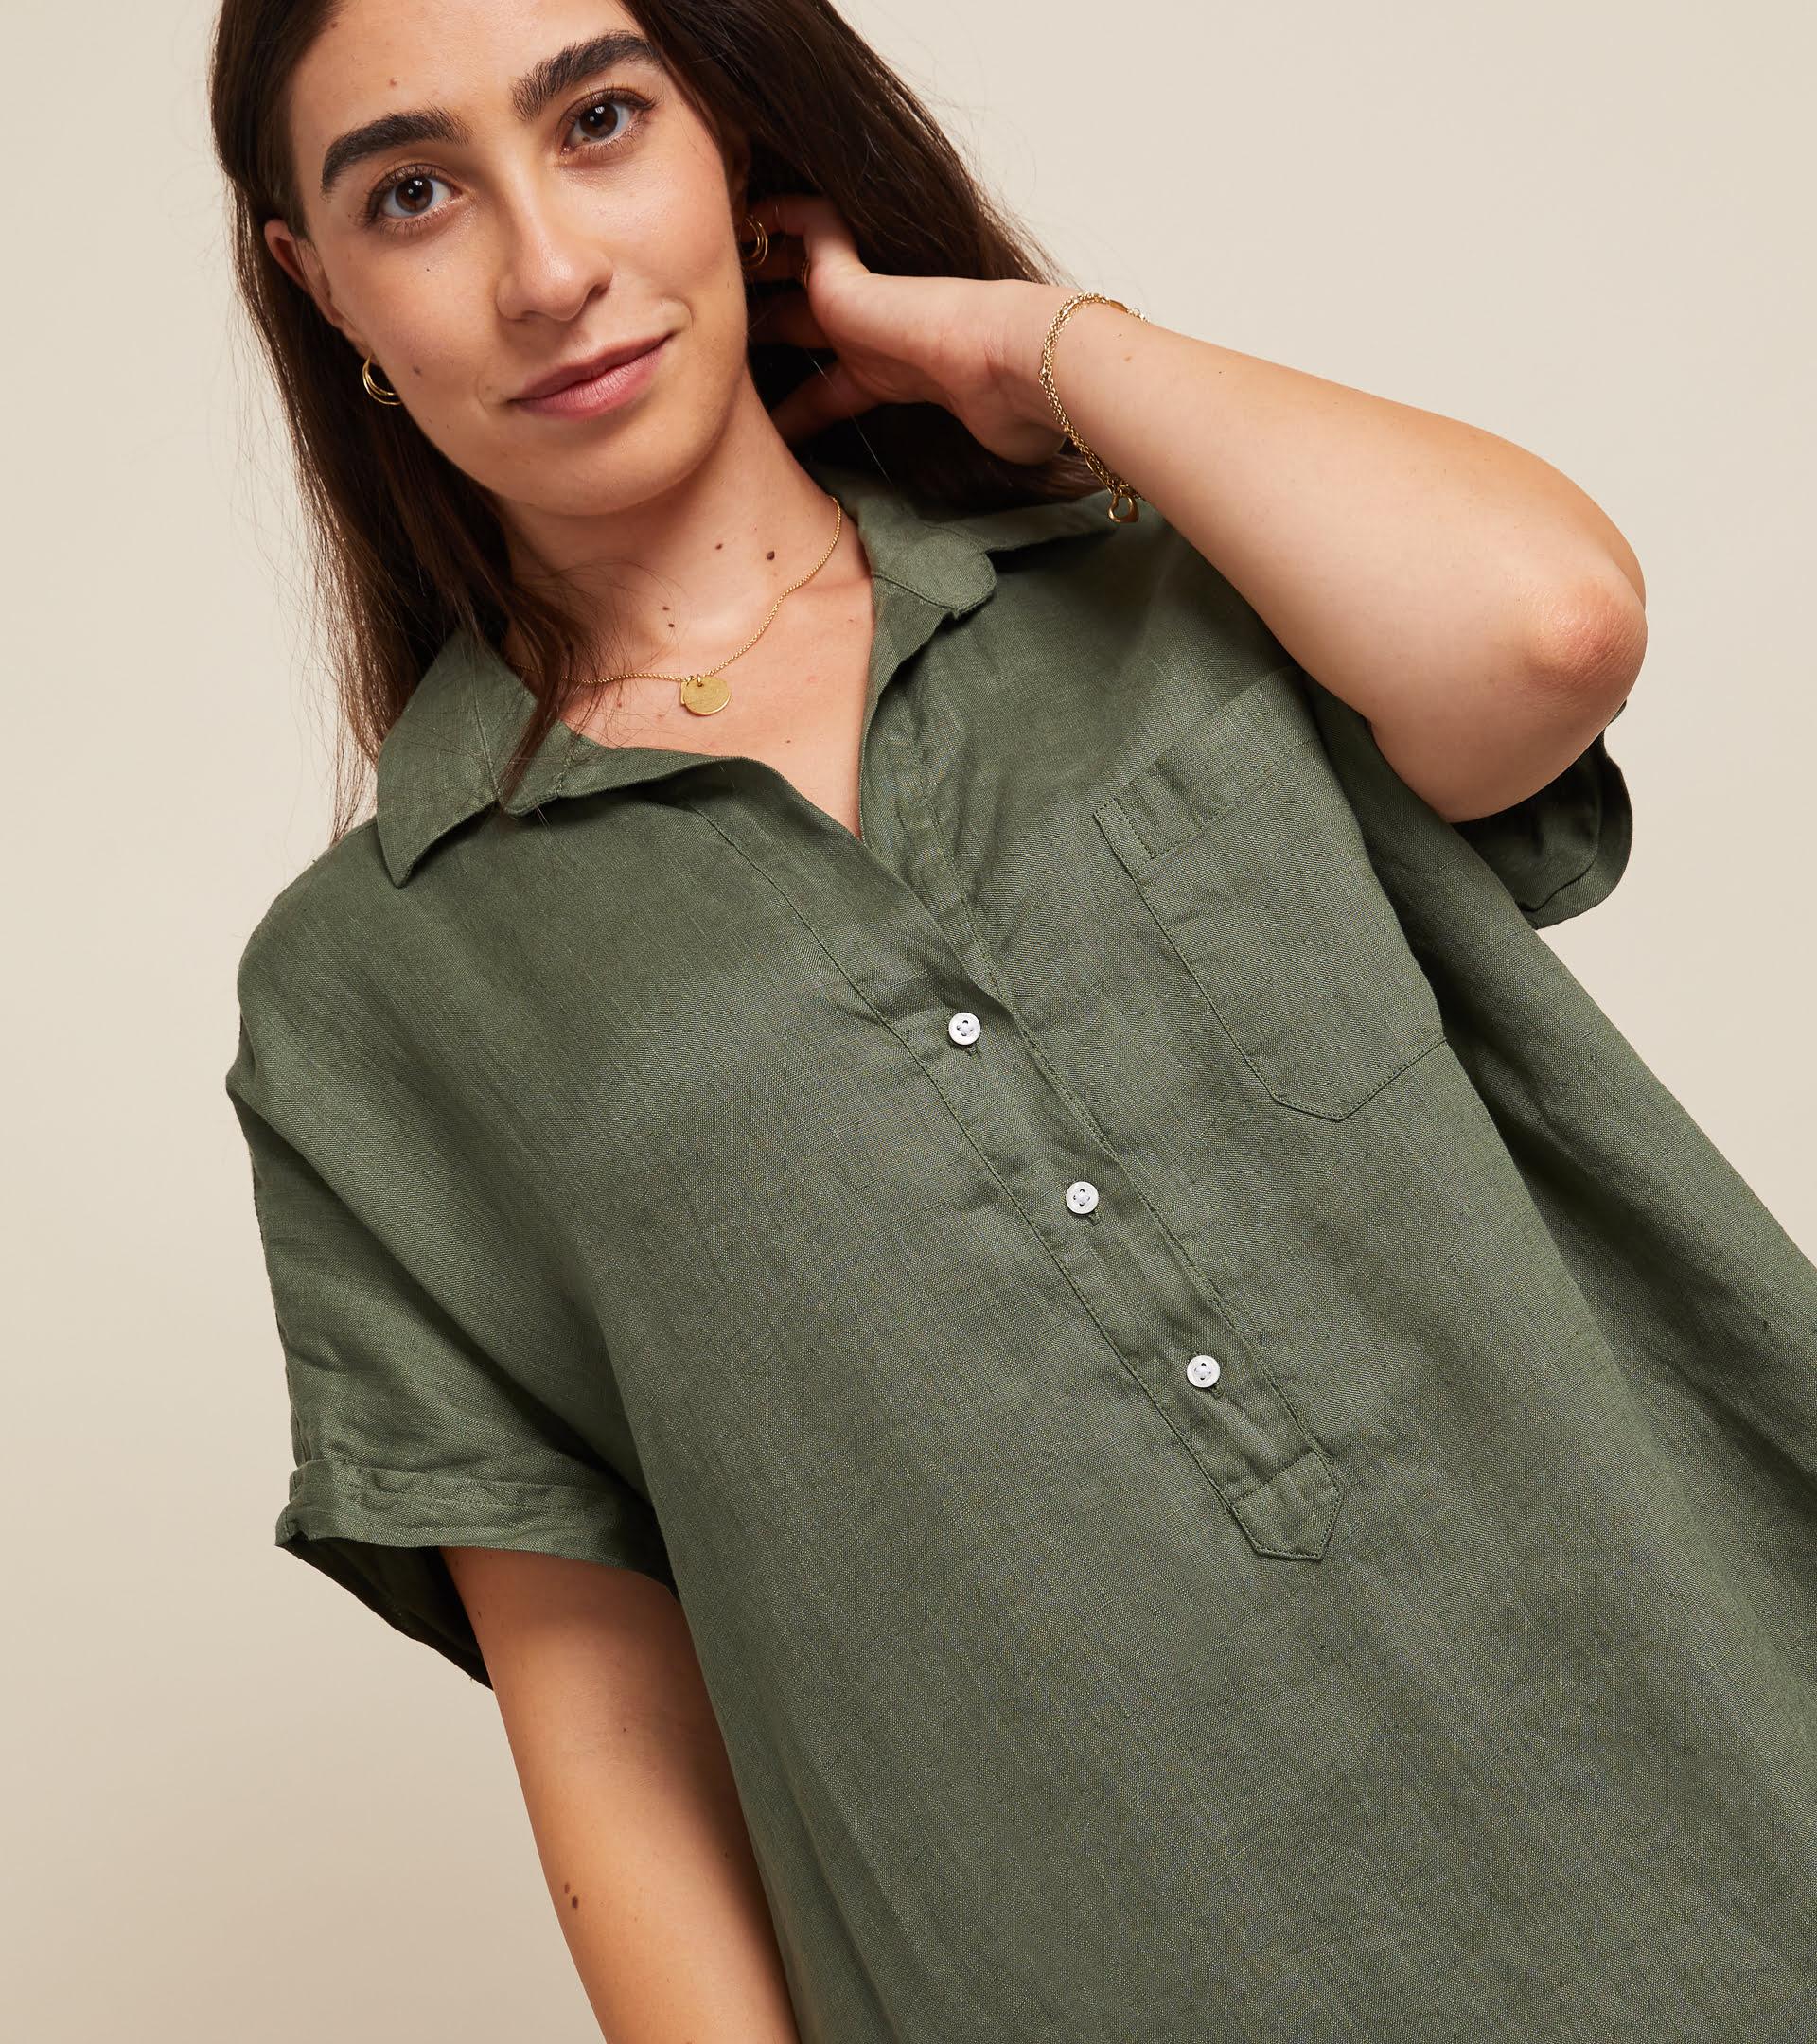 The Artist Short Sleeve Dress Army Green, Tumbled Linen Final Sale view 1